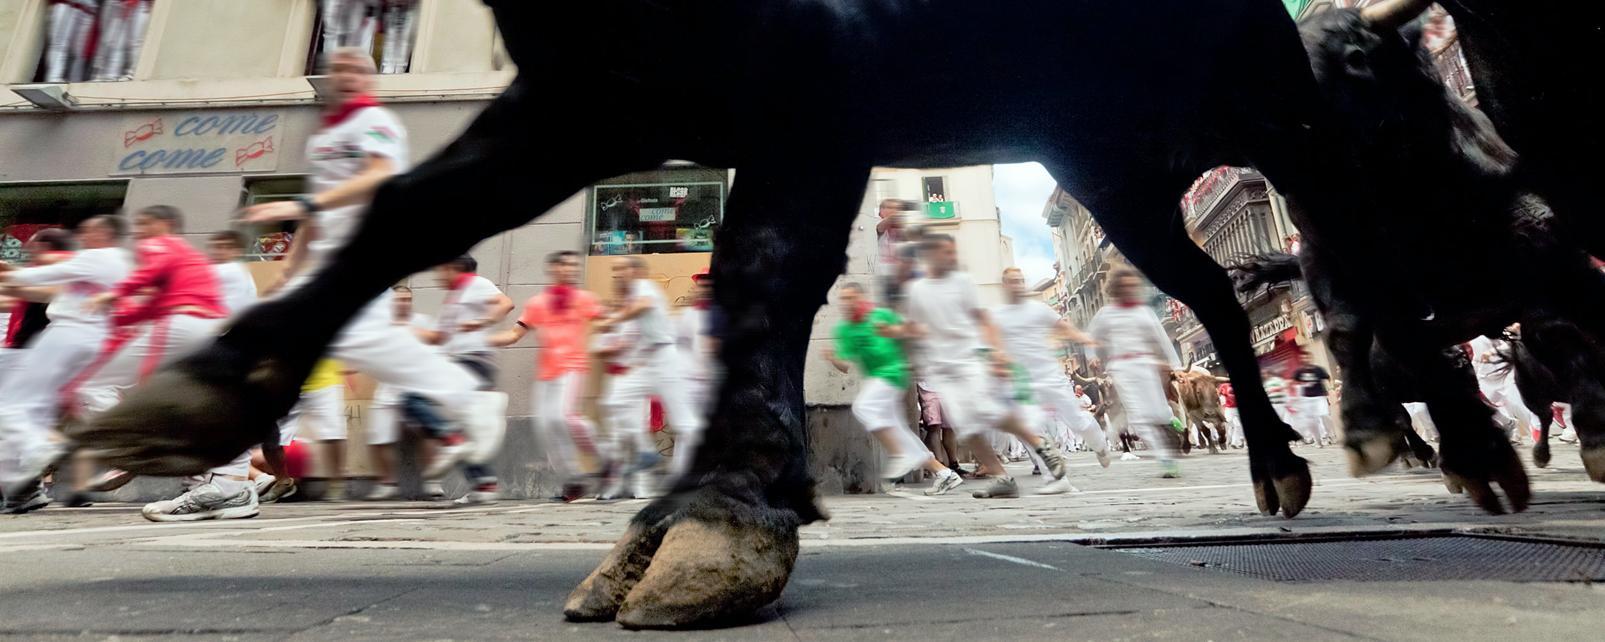 Europe, Espagne, Navarre, Pampelune, San Fermin, taureau, course, rue, gens, ville,